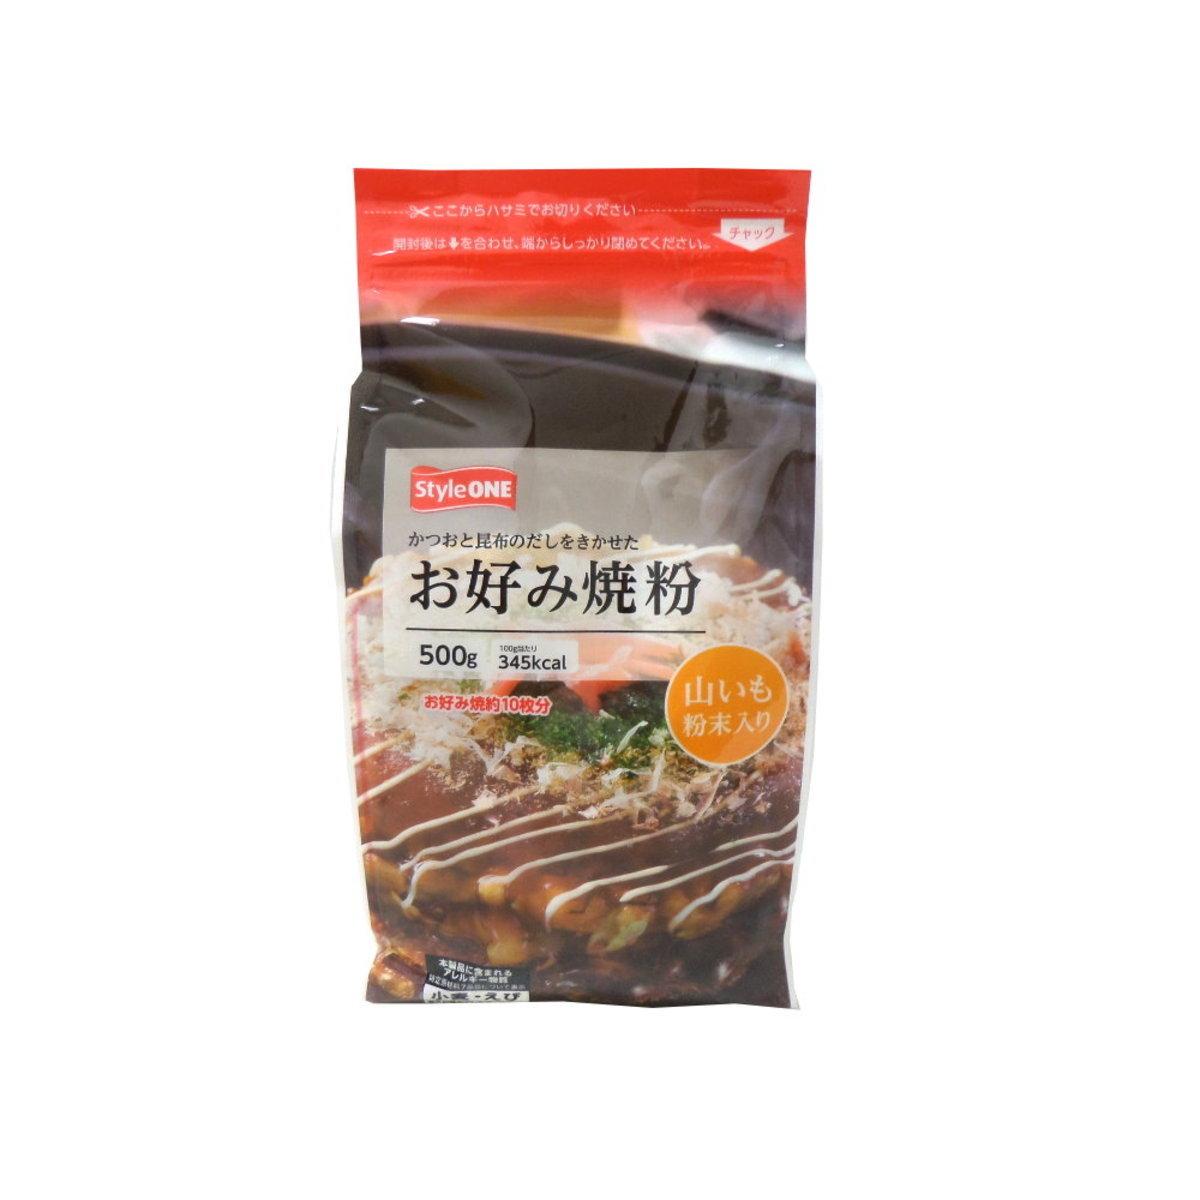 Style One 燒餅粉 500克